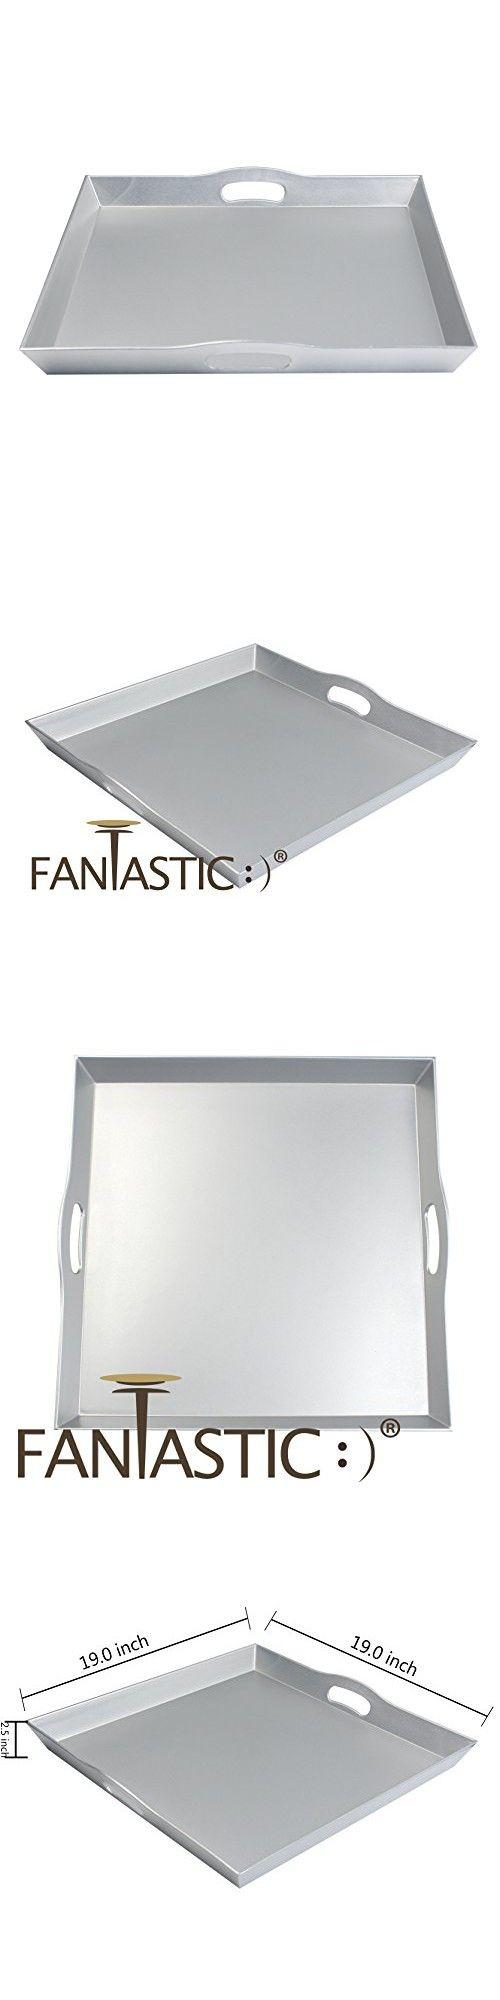 Black Decorative Tray Alluring 428 Best Decorative Trays Images On Pinterest  Decorative Trays Design Decoration